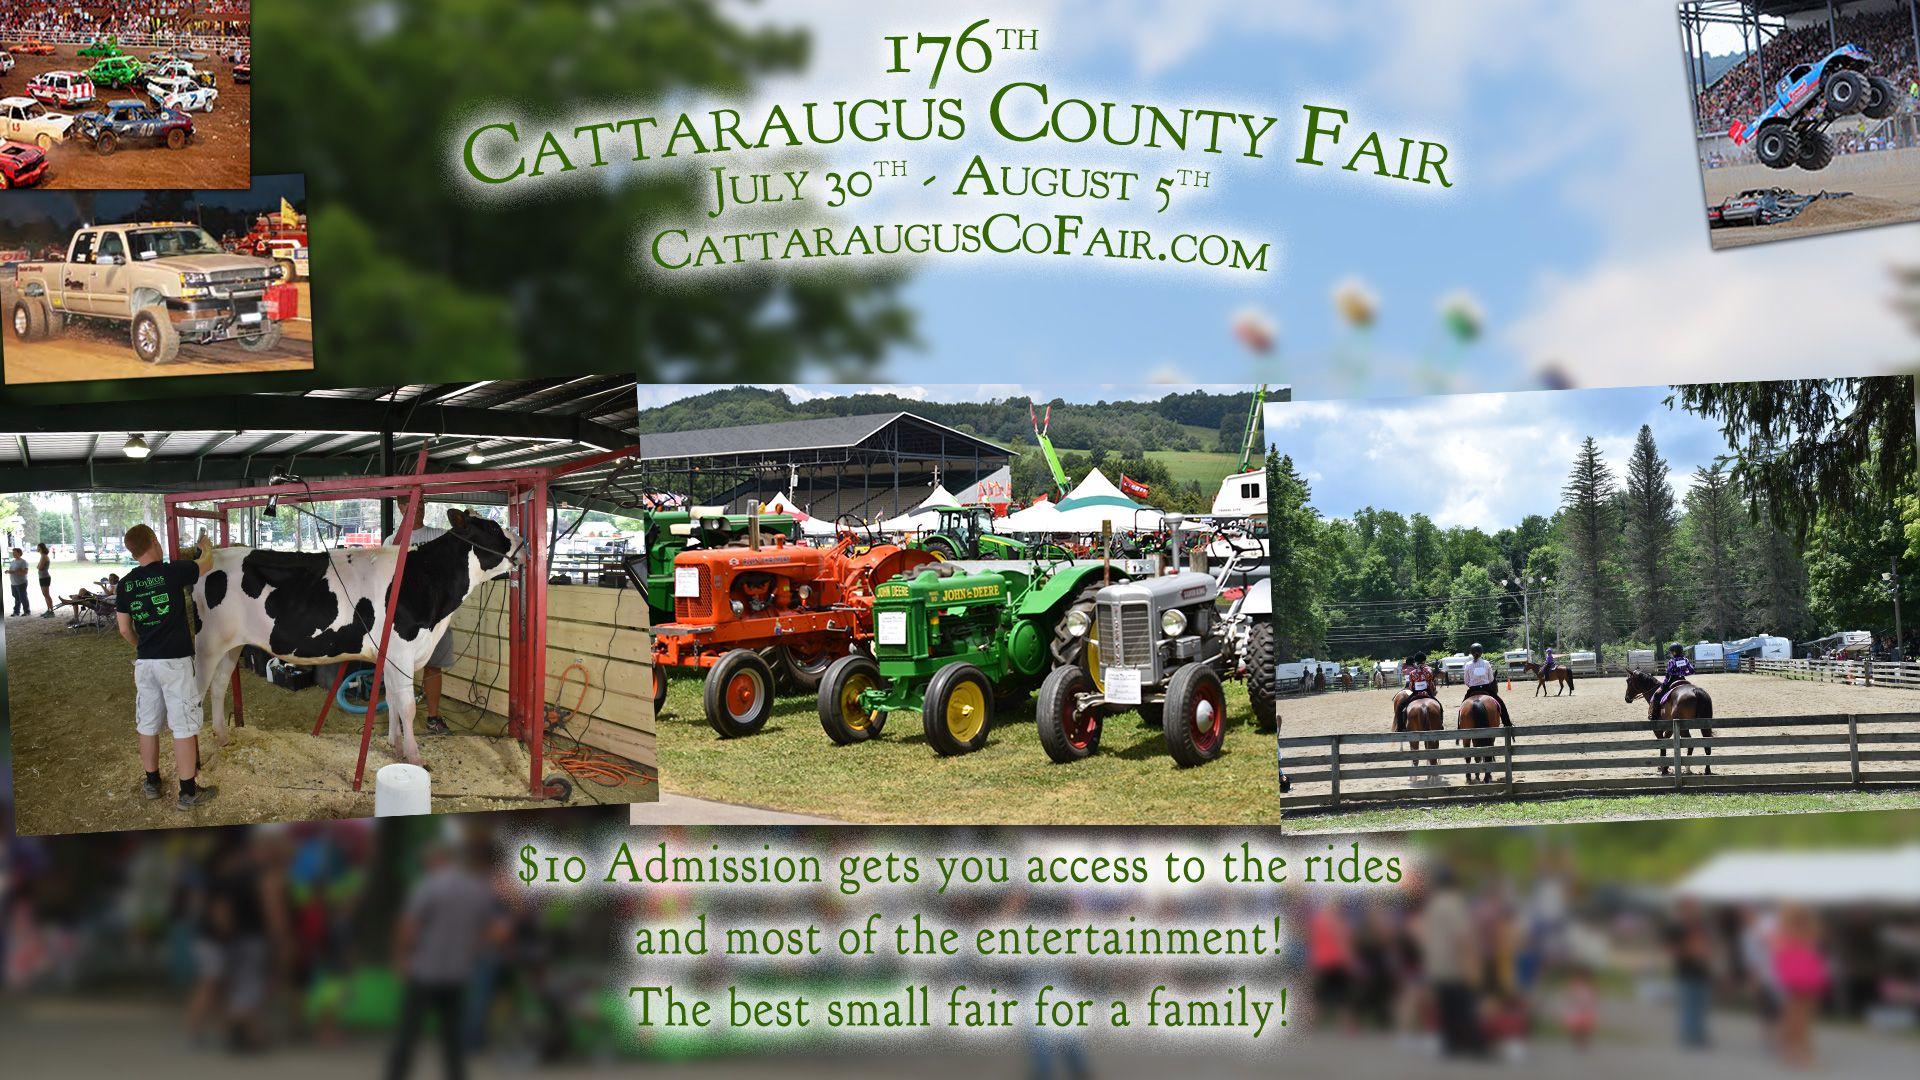 2018 cattaraugus county fair cattaraugus county county